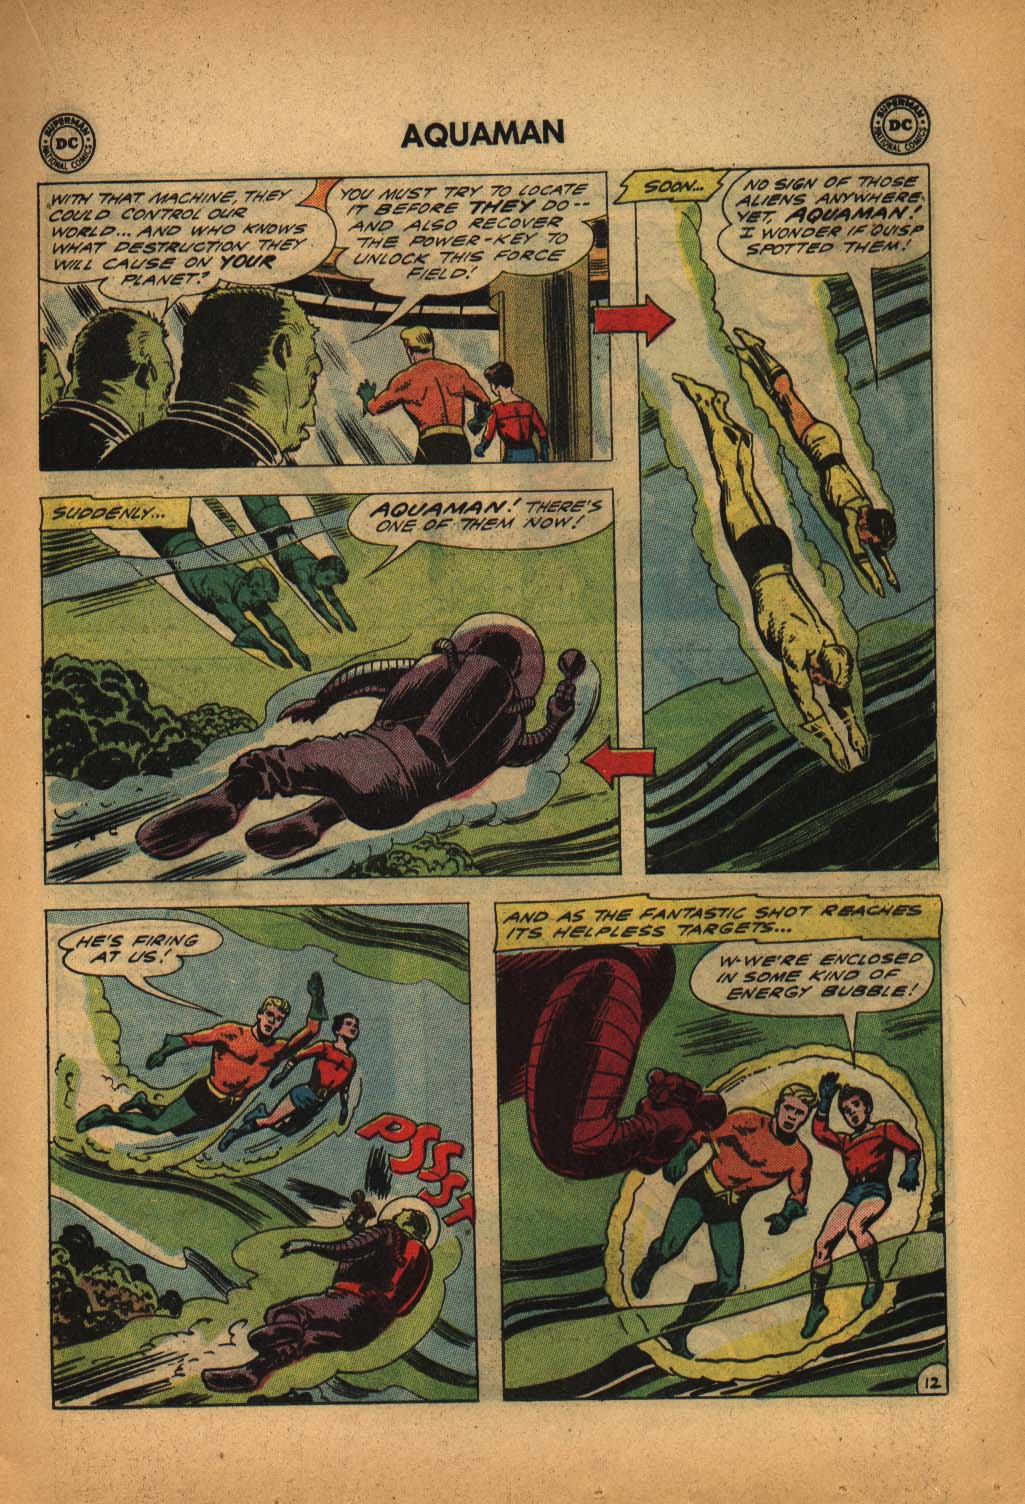 Read online Aquaman (1962) comic -  Issue #4 - 17